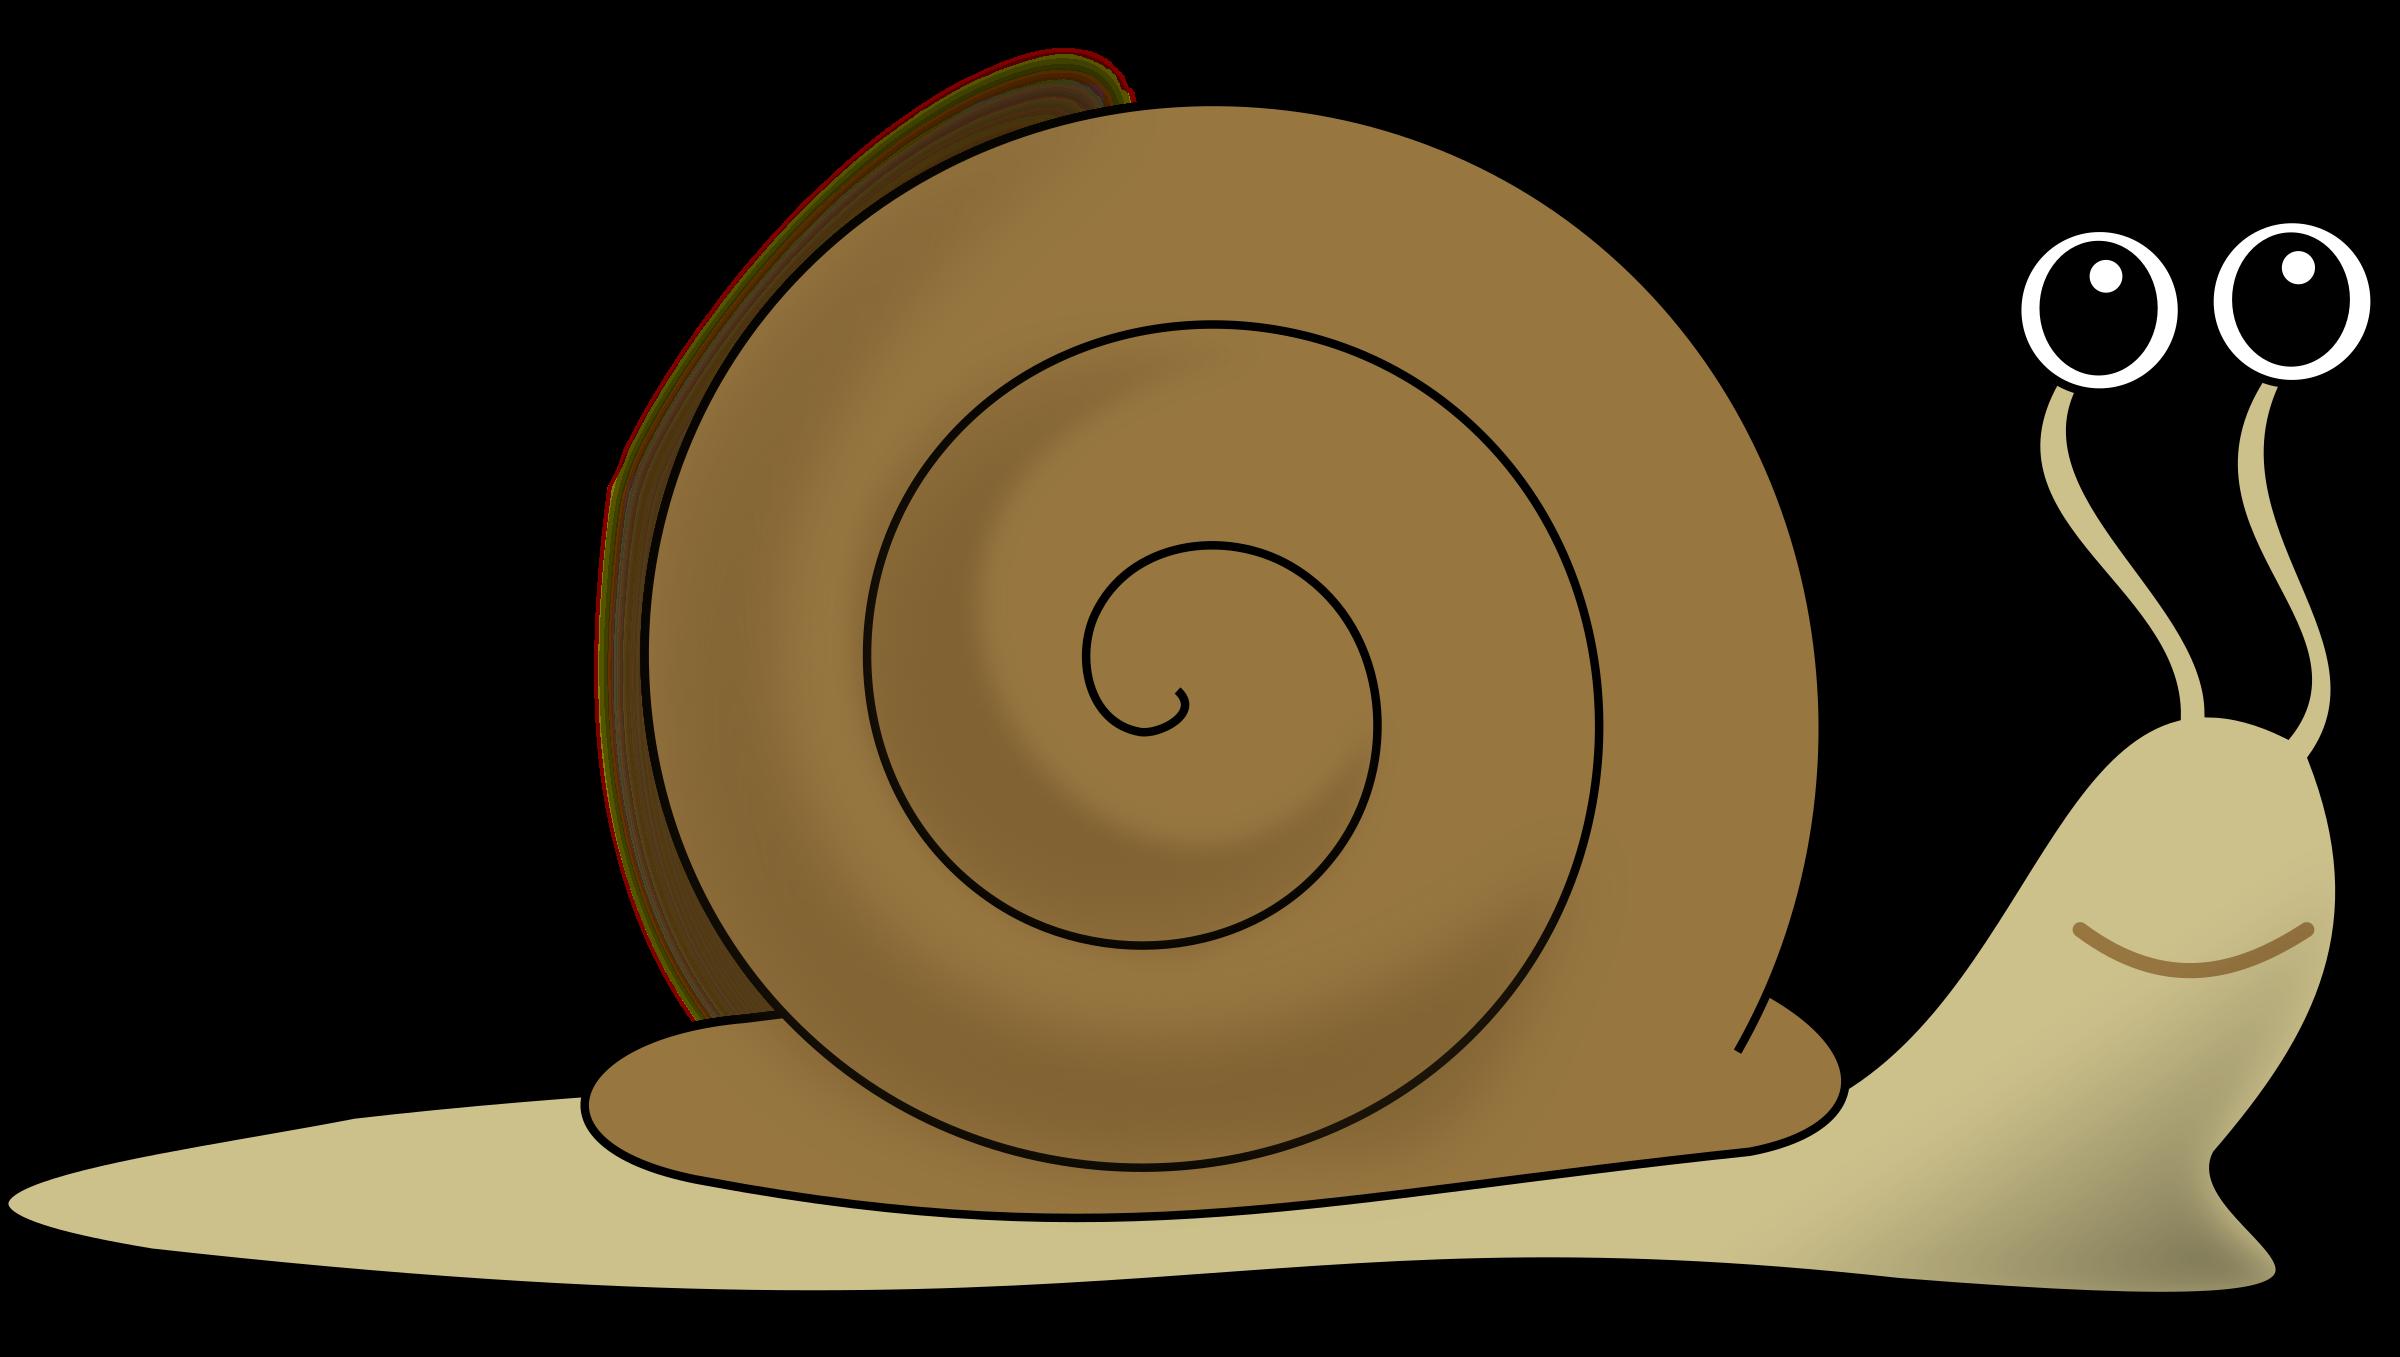 Clipart snail escargot decroissance - Clipart escargot ...